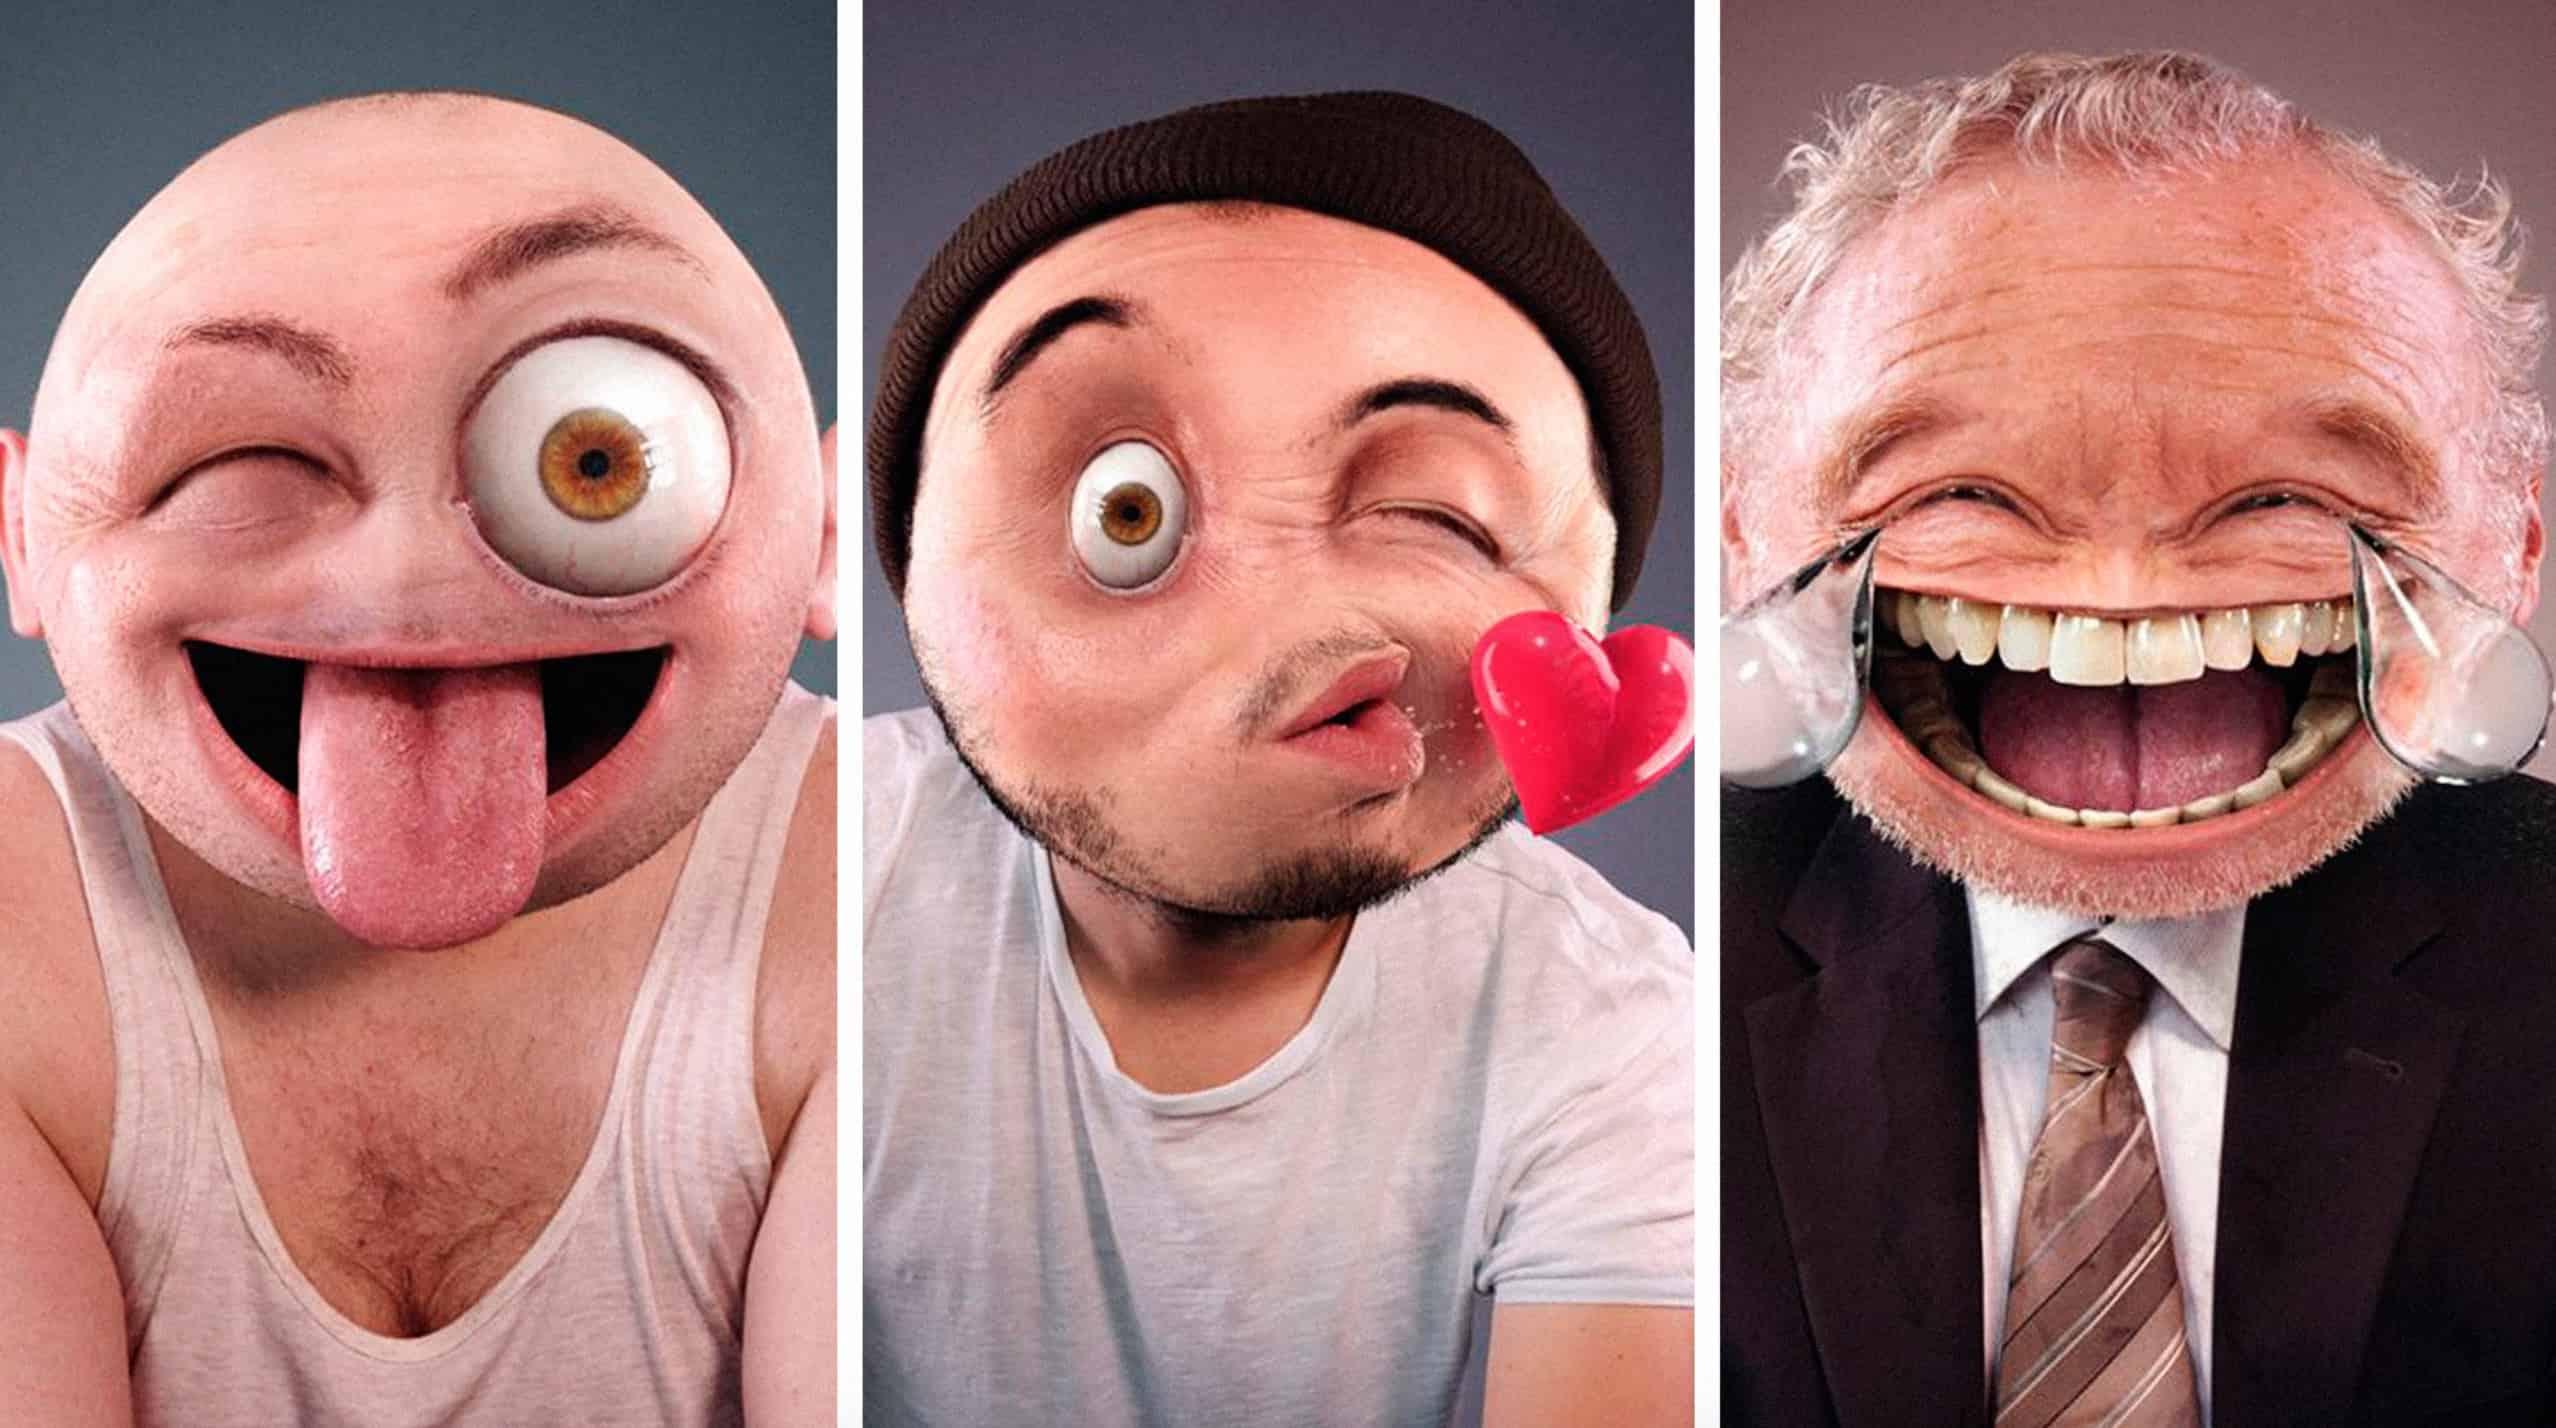 843 WhatsApp Emoticons & Meanings: Emoji List | Appamatix